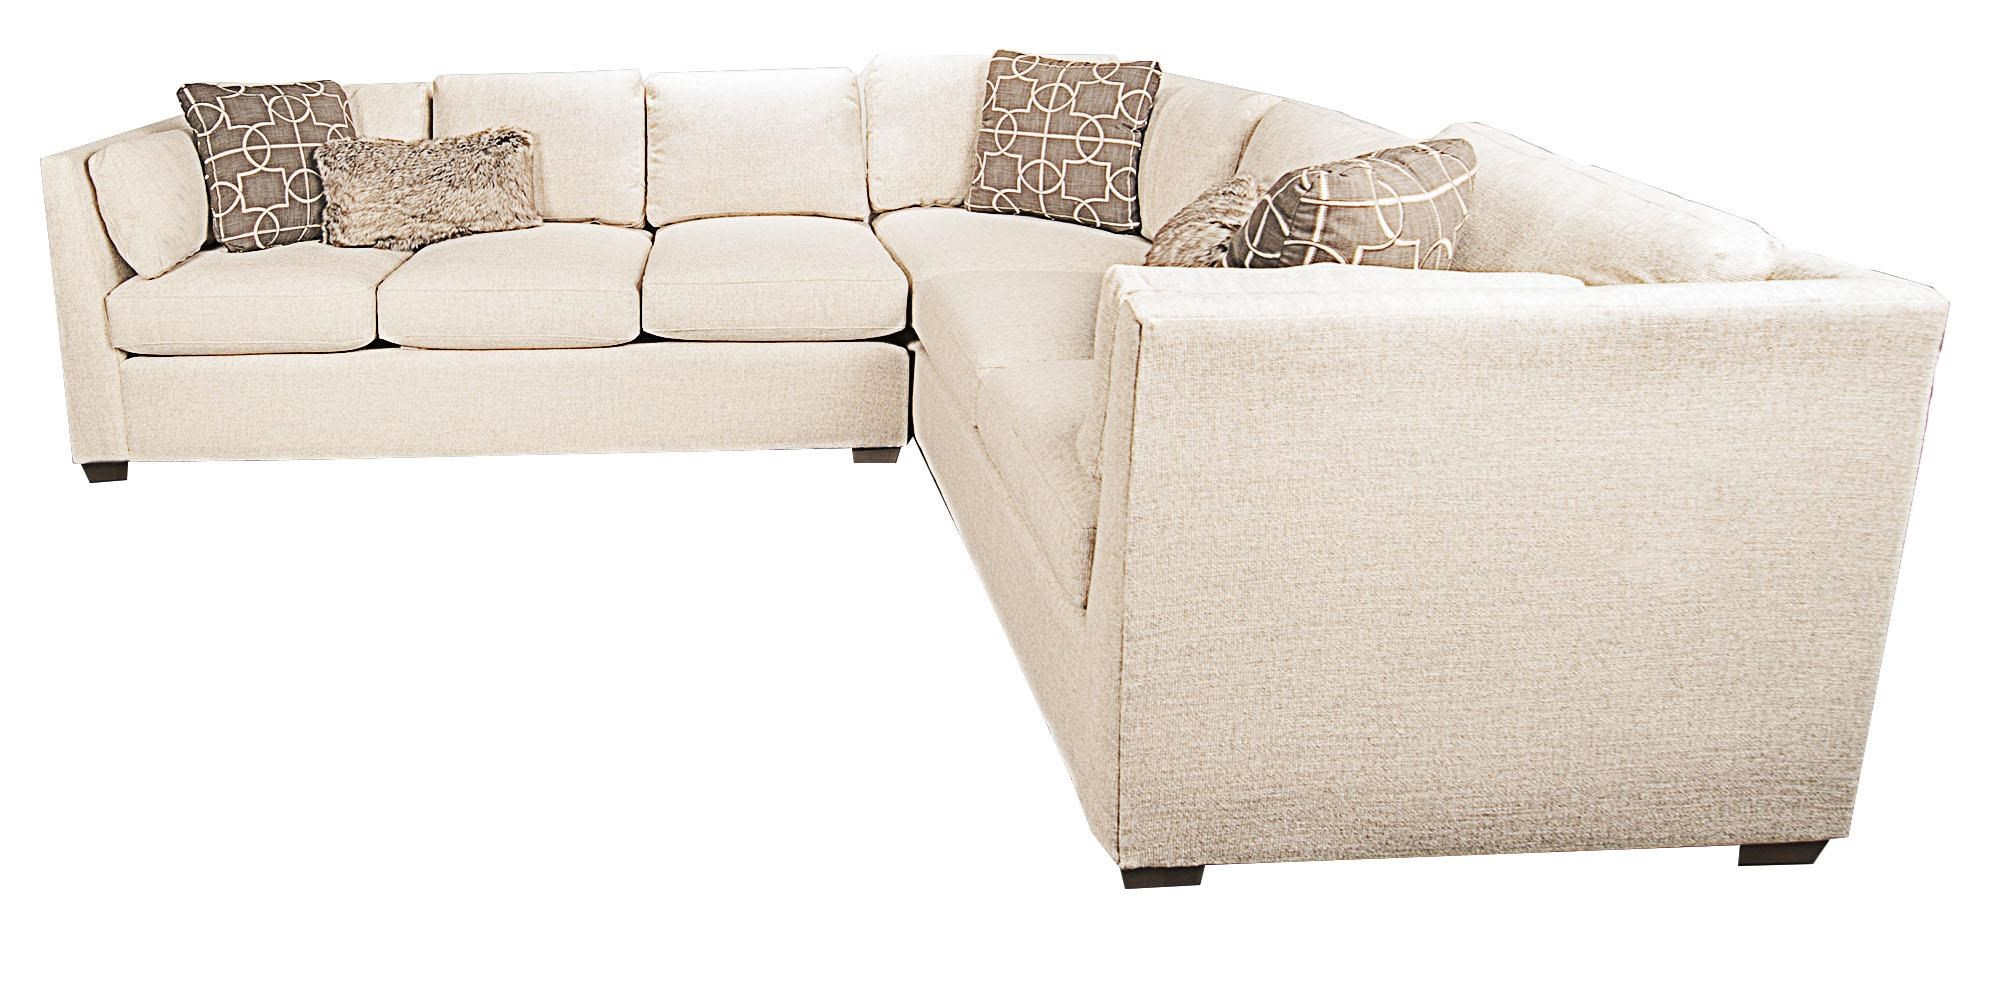 Morris Home Furnishings Highline Highline 2-Piece Sectional - Item Number: 134124053